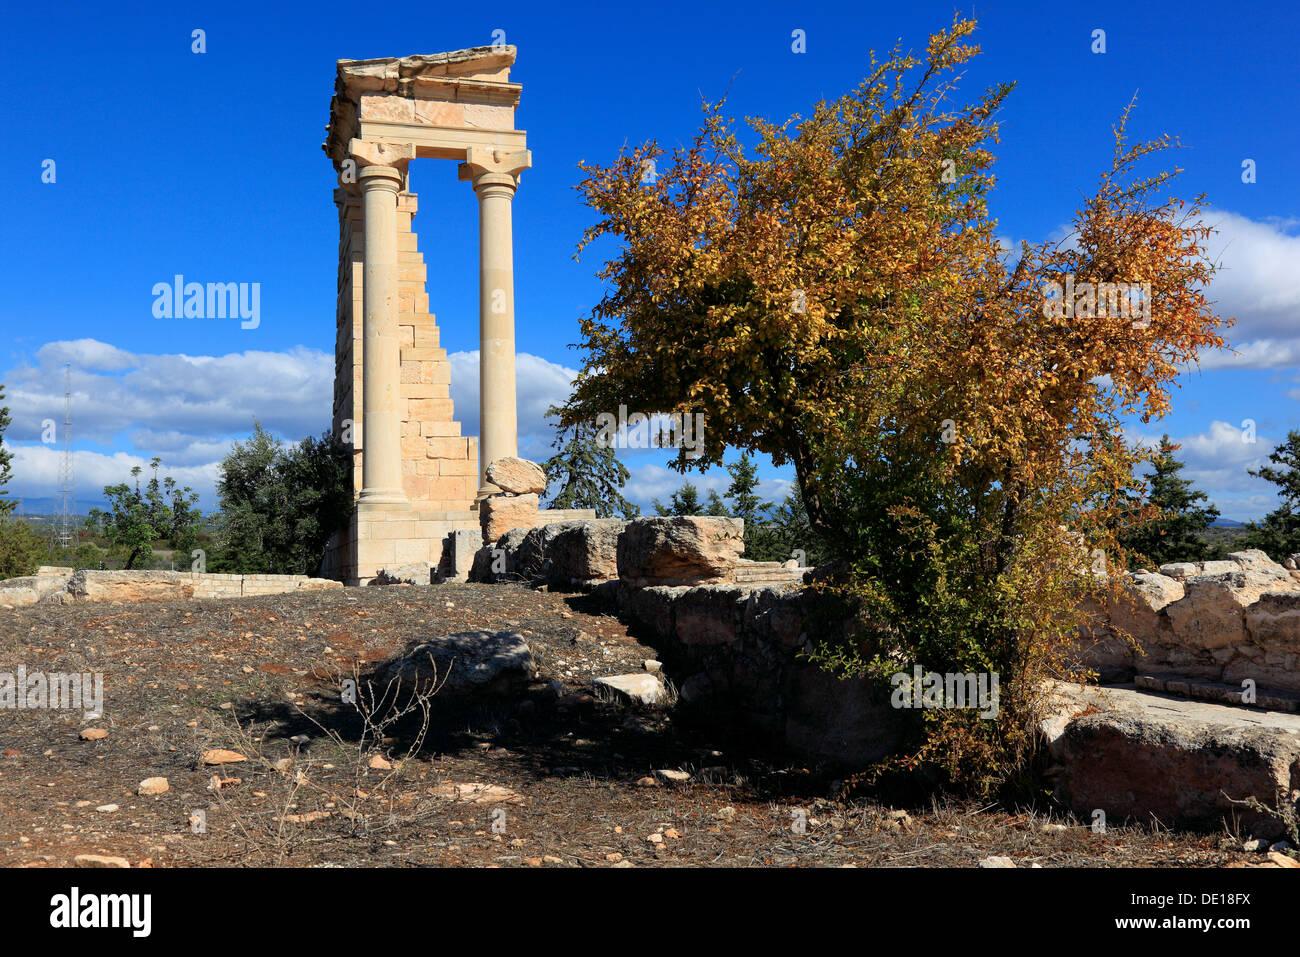 Cyprus, Kourion, Assyrian Ku-ri-i, ancient Greek, Latin curium Hylates sanctuary of Apollo, remains of Hylatesheiligtums, histor - Stock Image